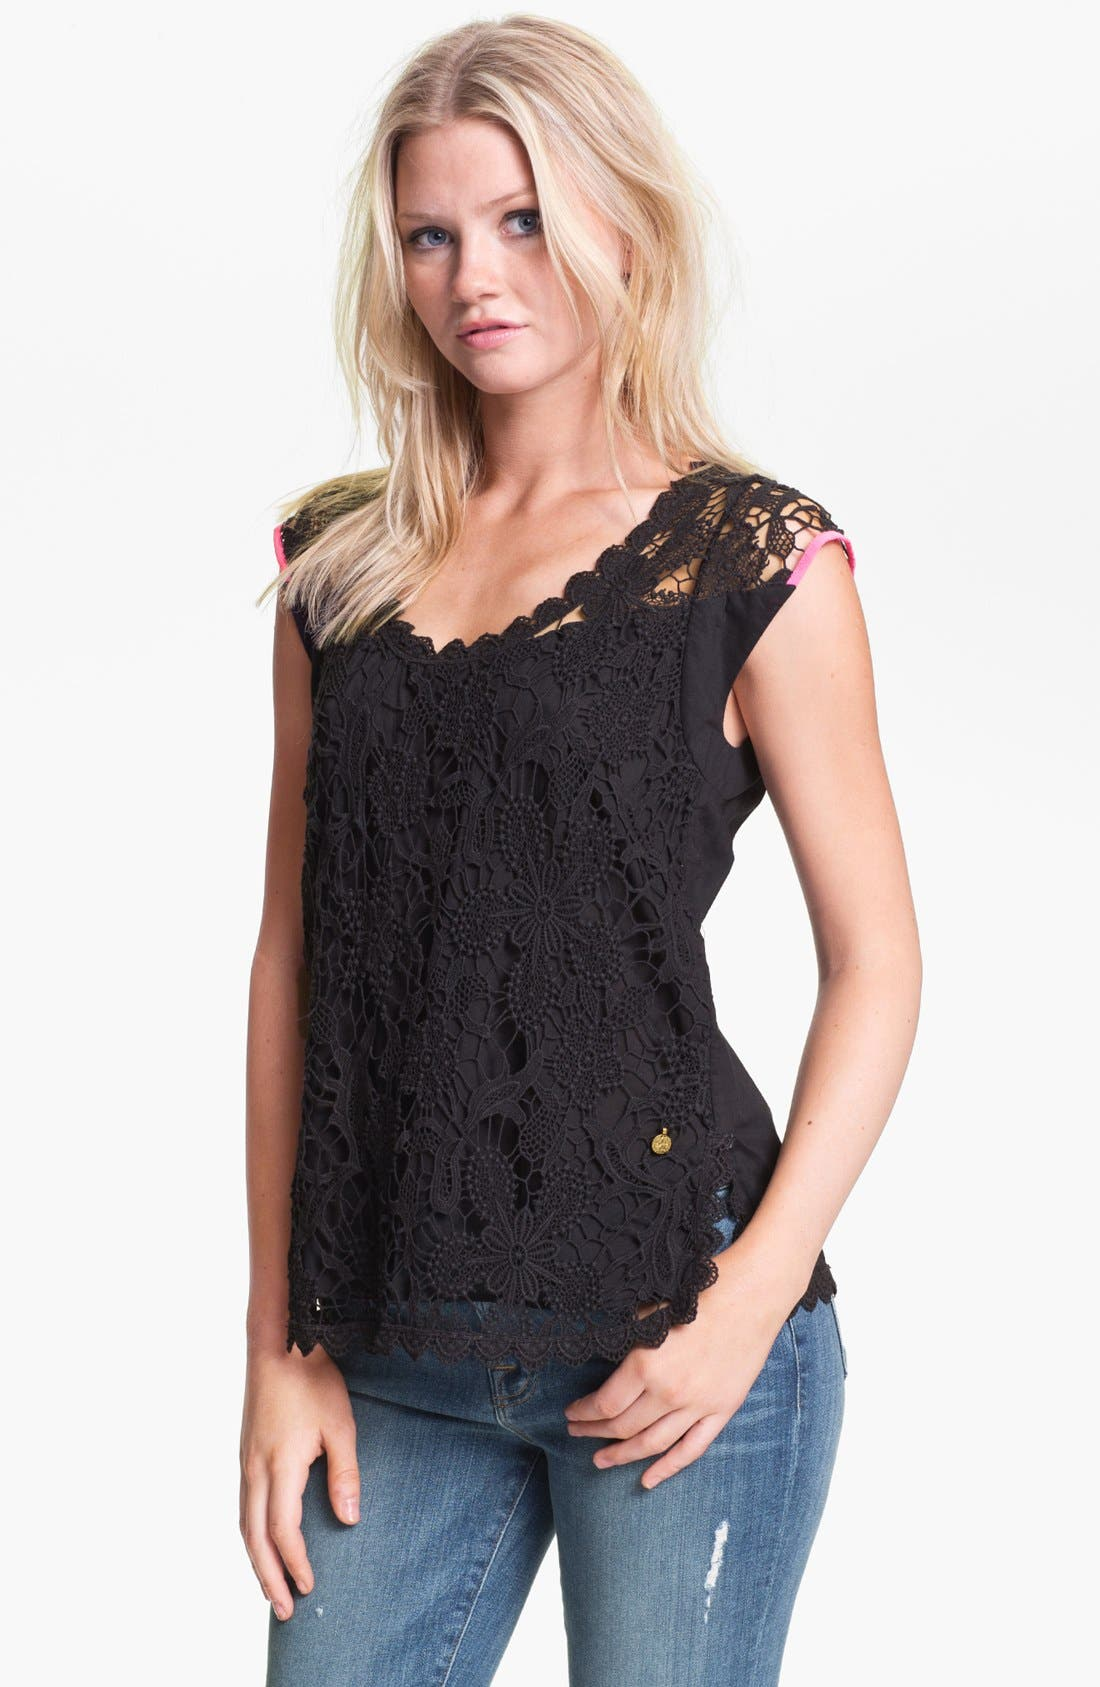 Main Image - Maison Scotch Crochet Top